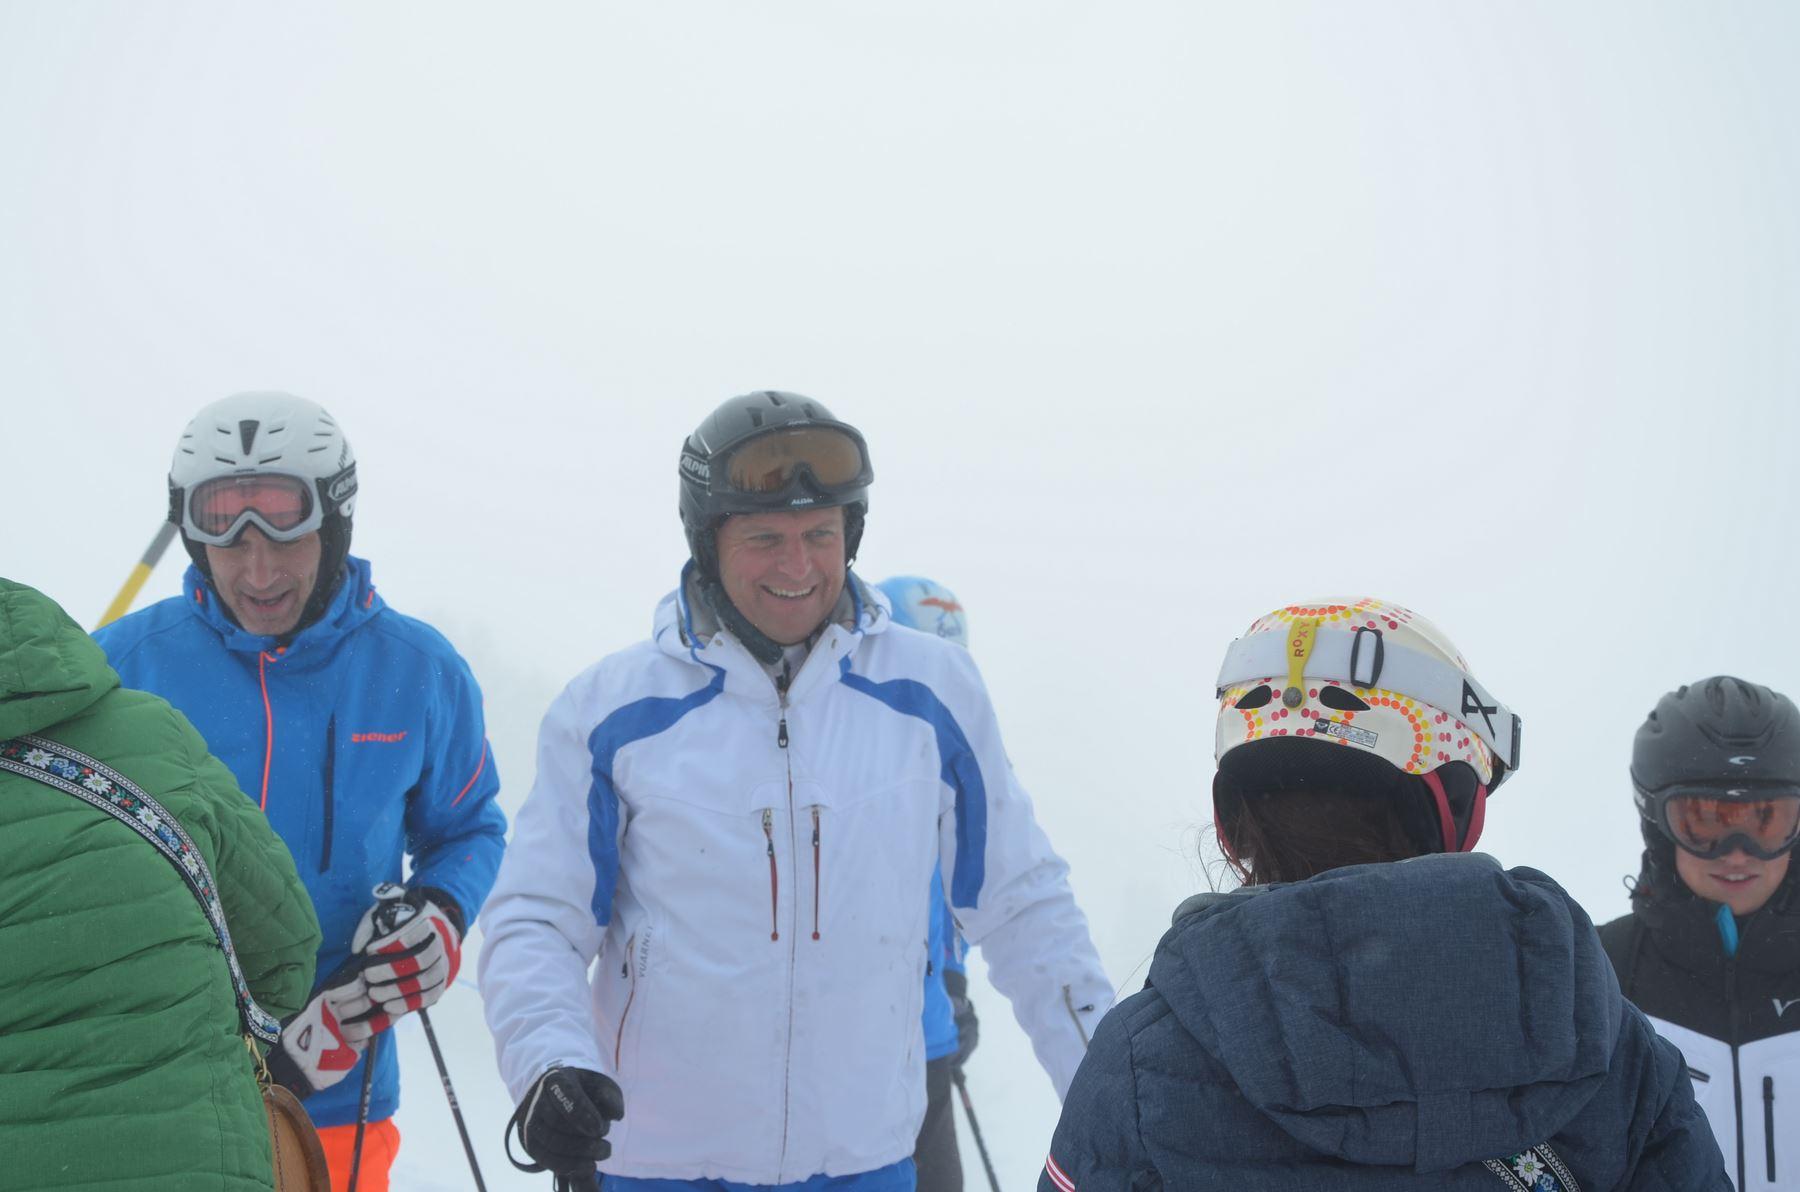 2015-03-22 BV Zillertal Skirennen 015.JPG